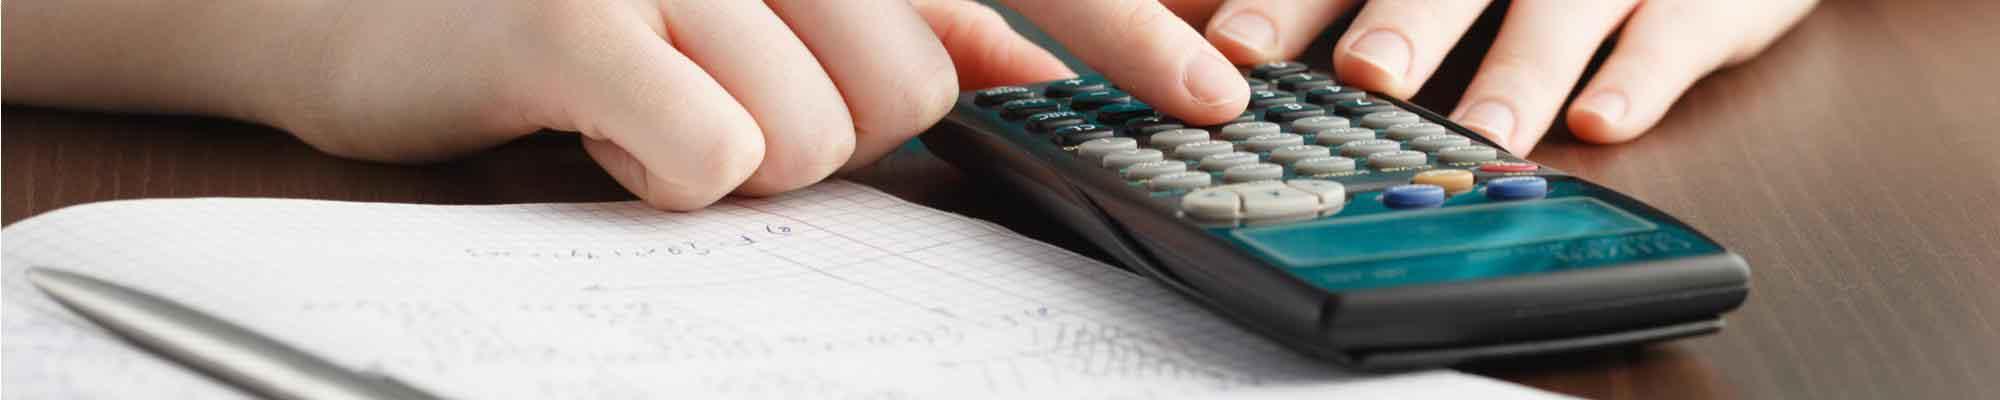 A mathematics student using a calculator and hand-writing mathematics